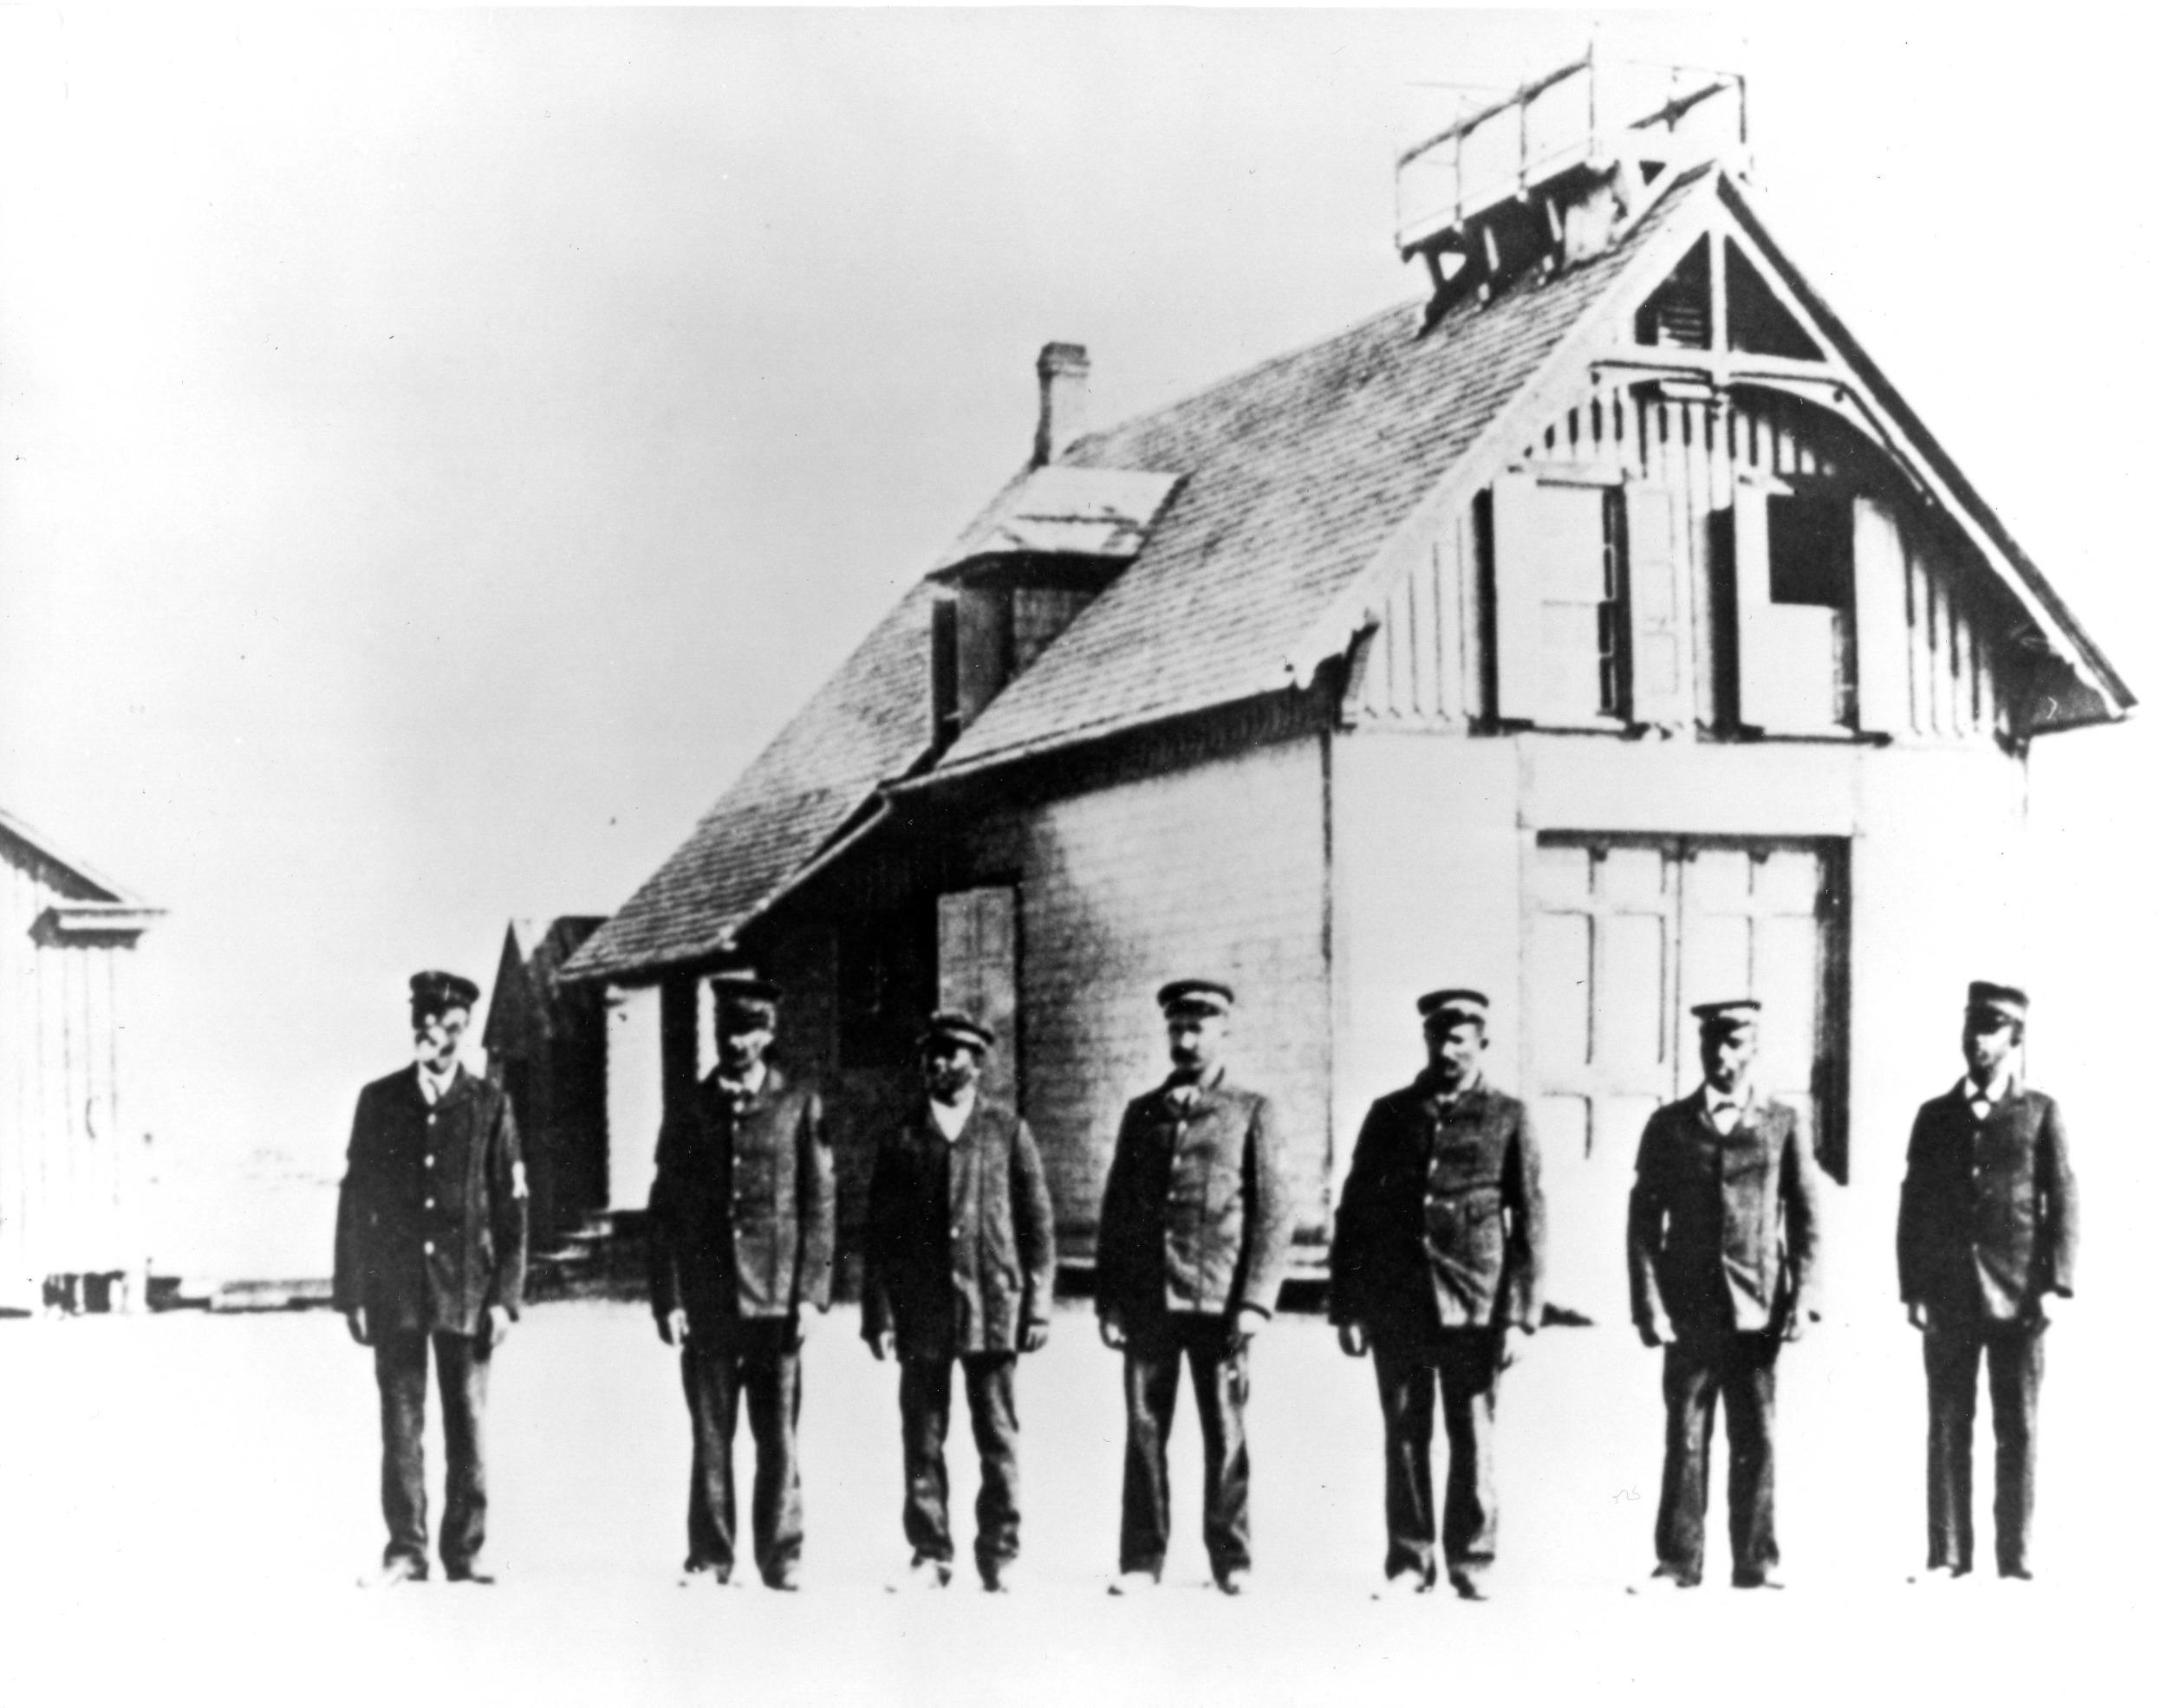 Richard Etheridge and his crew at Pea Island Lifesaving Station.